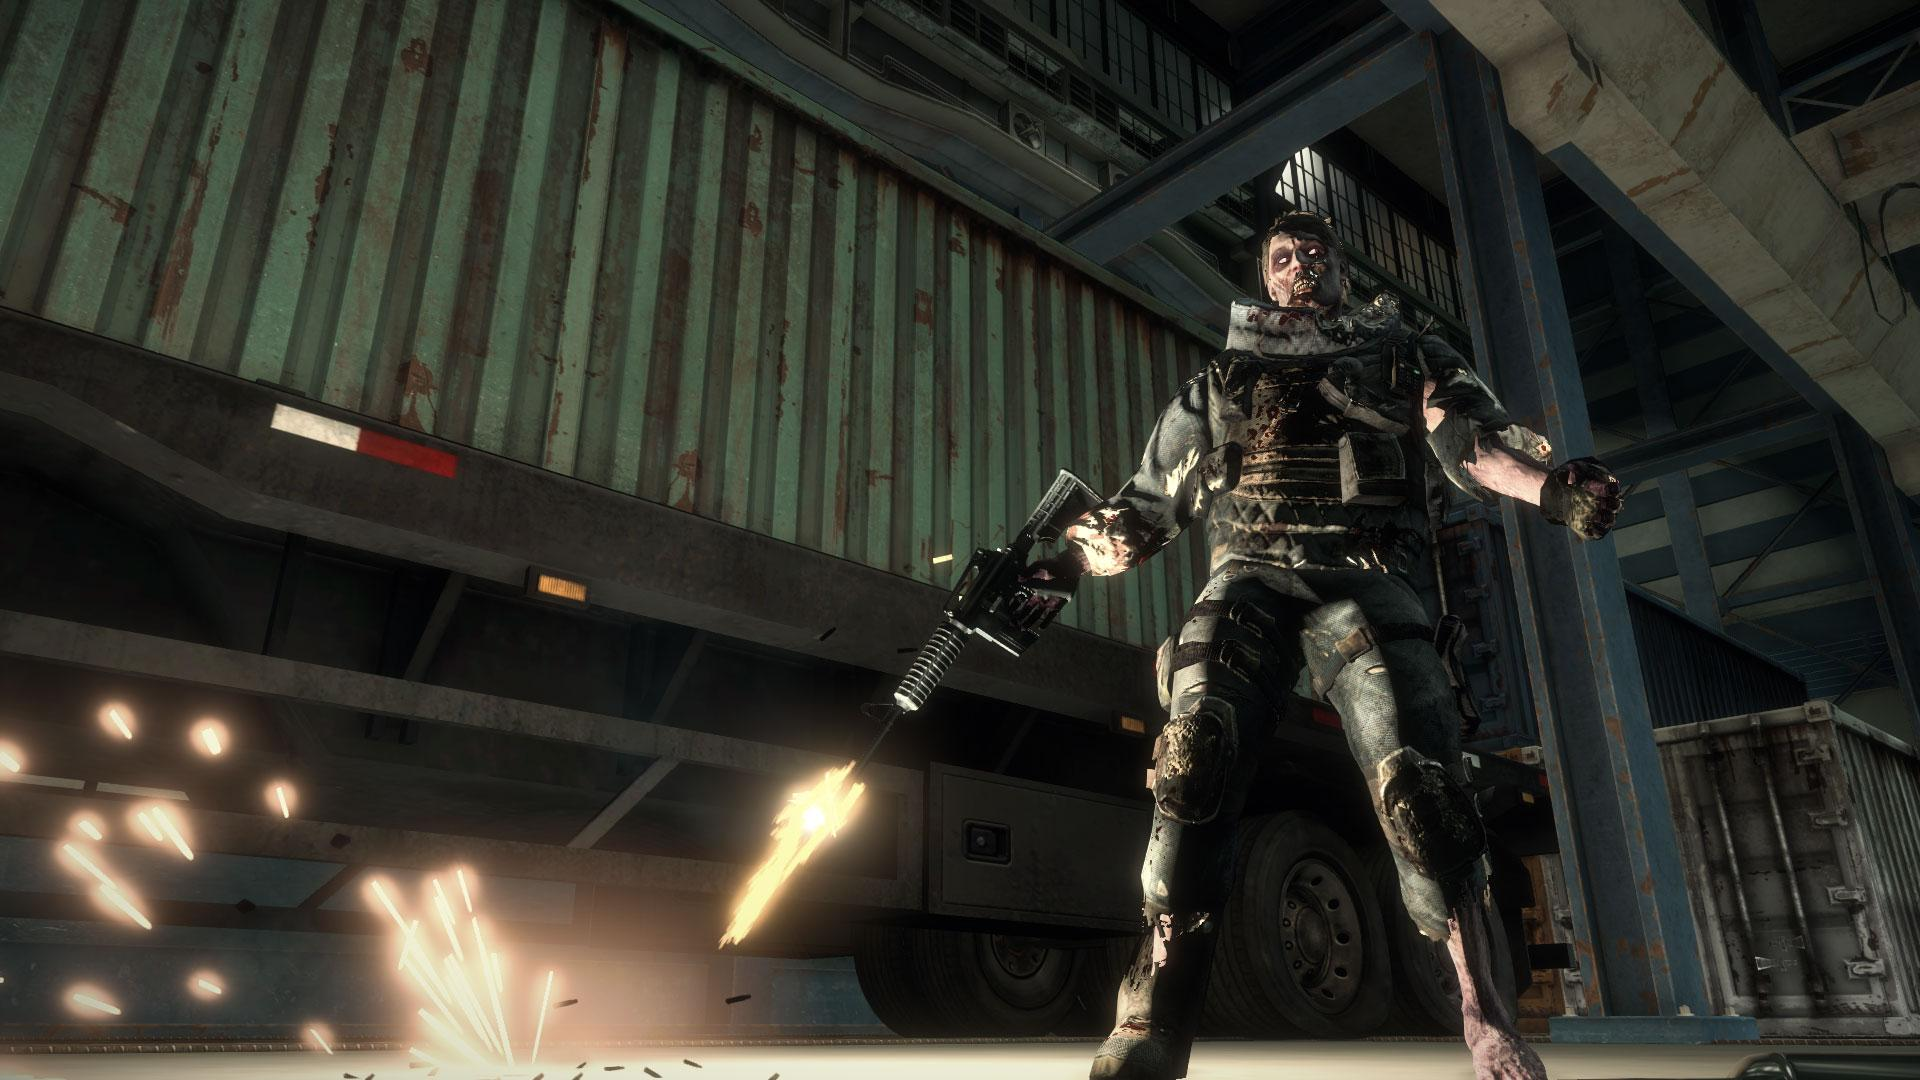 Dead-Rising-3-Operation-Broken-Eagle-screenshot-4